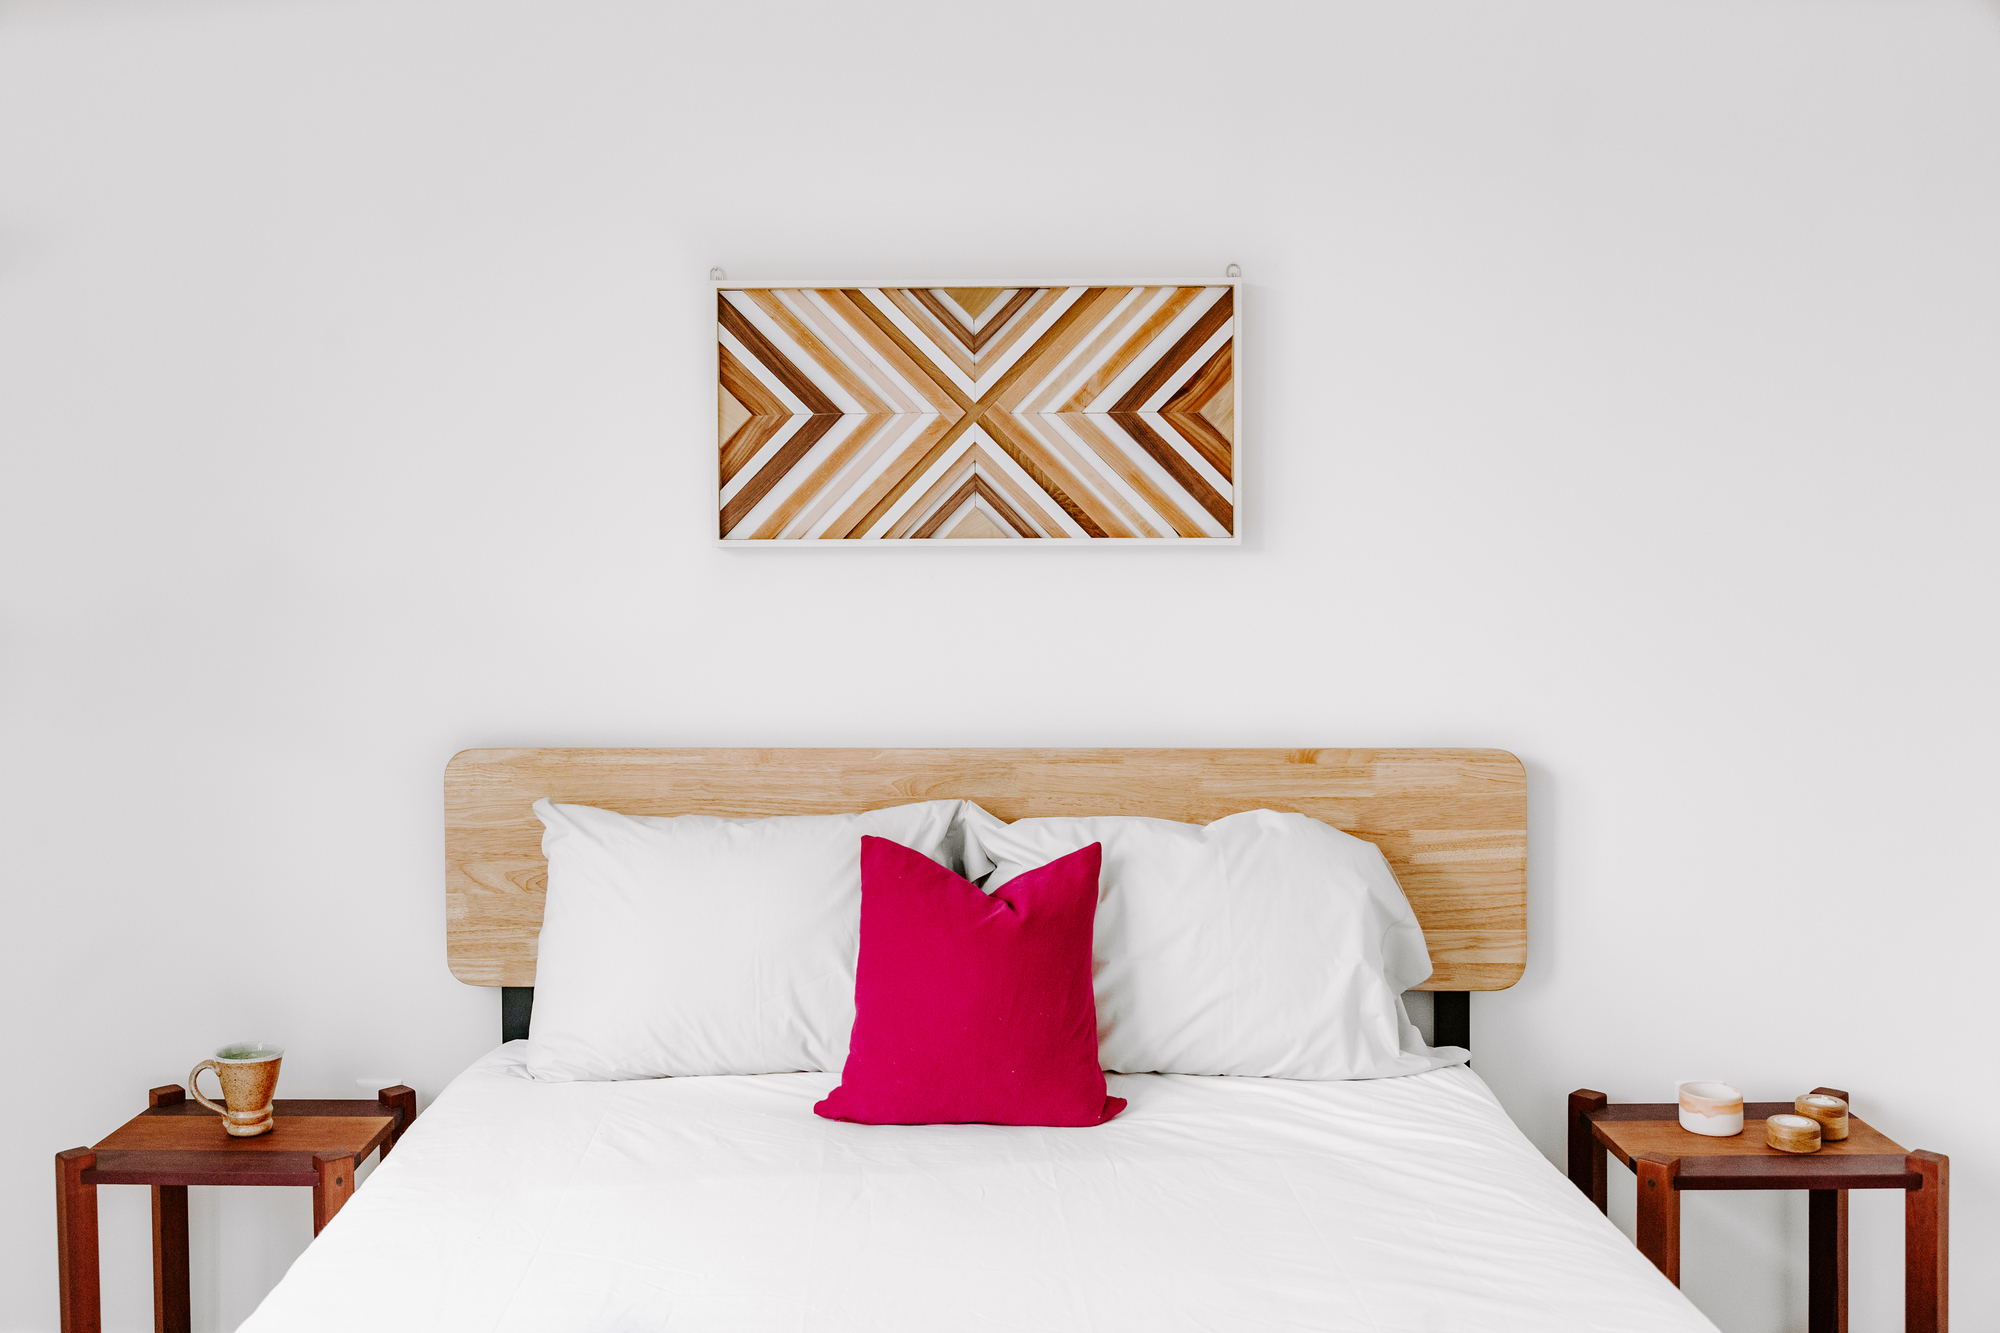 Rustic Geometric Wood Wall Art